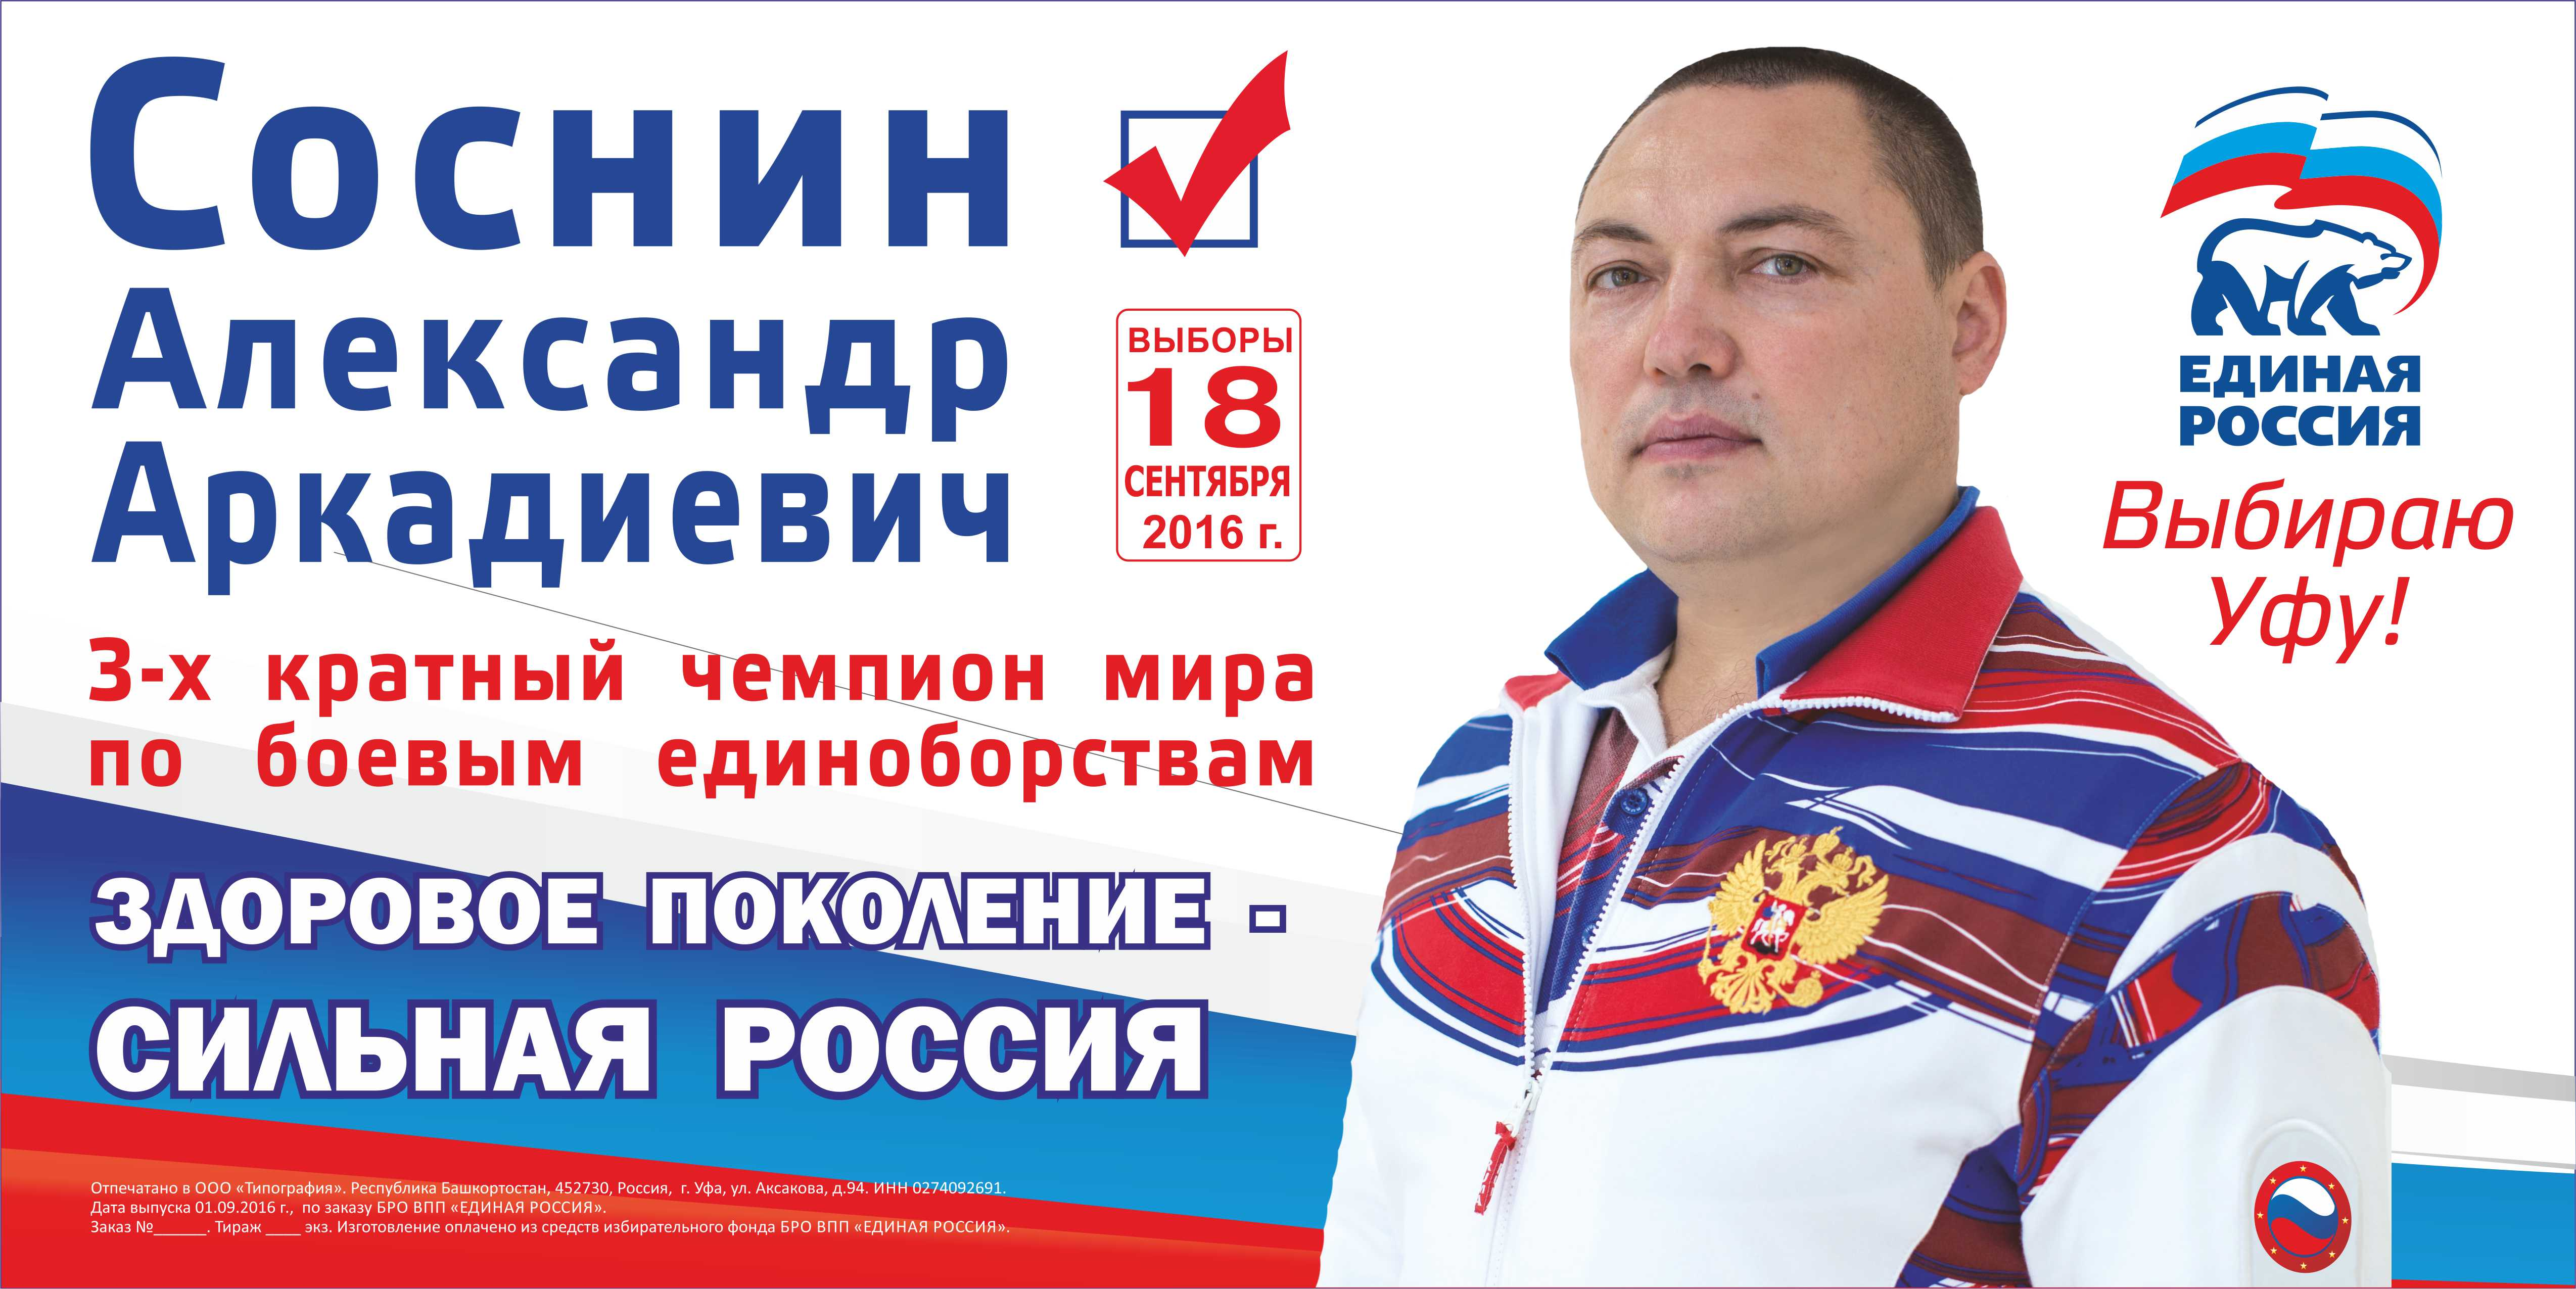 http://sbirb.combatsd.ru/images/upload/Баннер%206%20000х3%20000.jpg